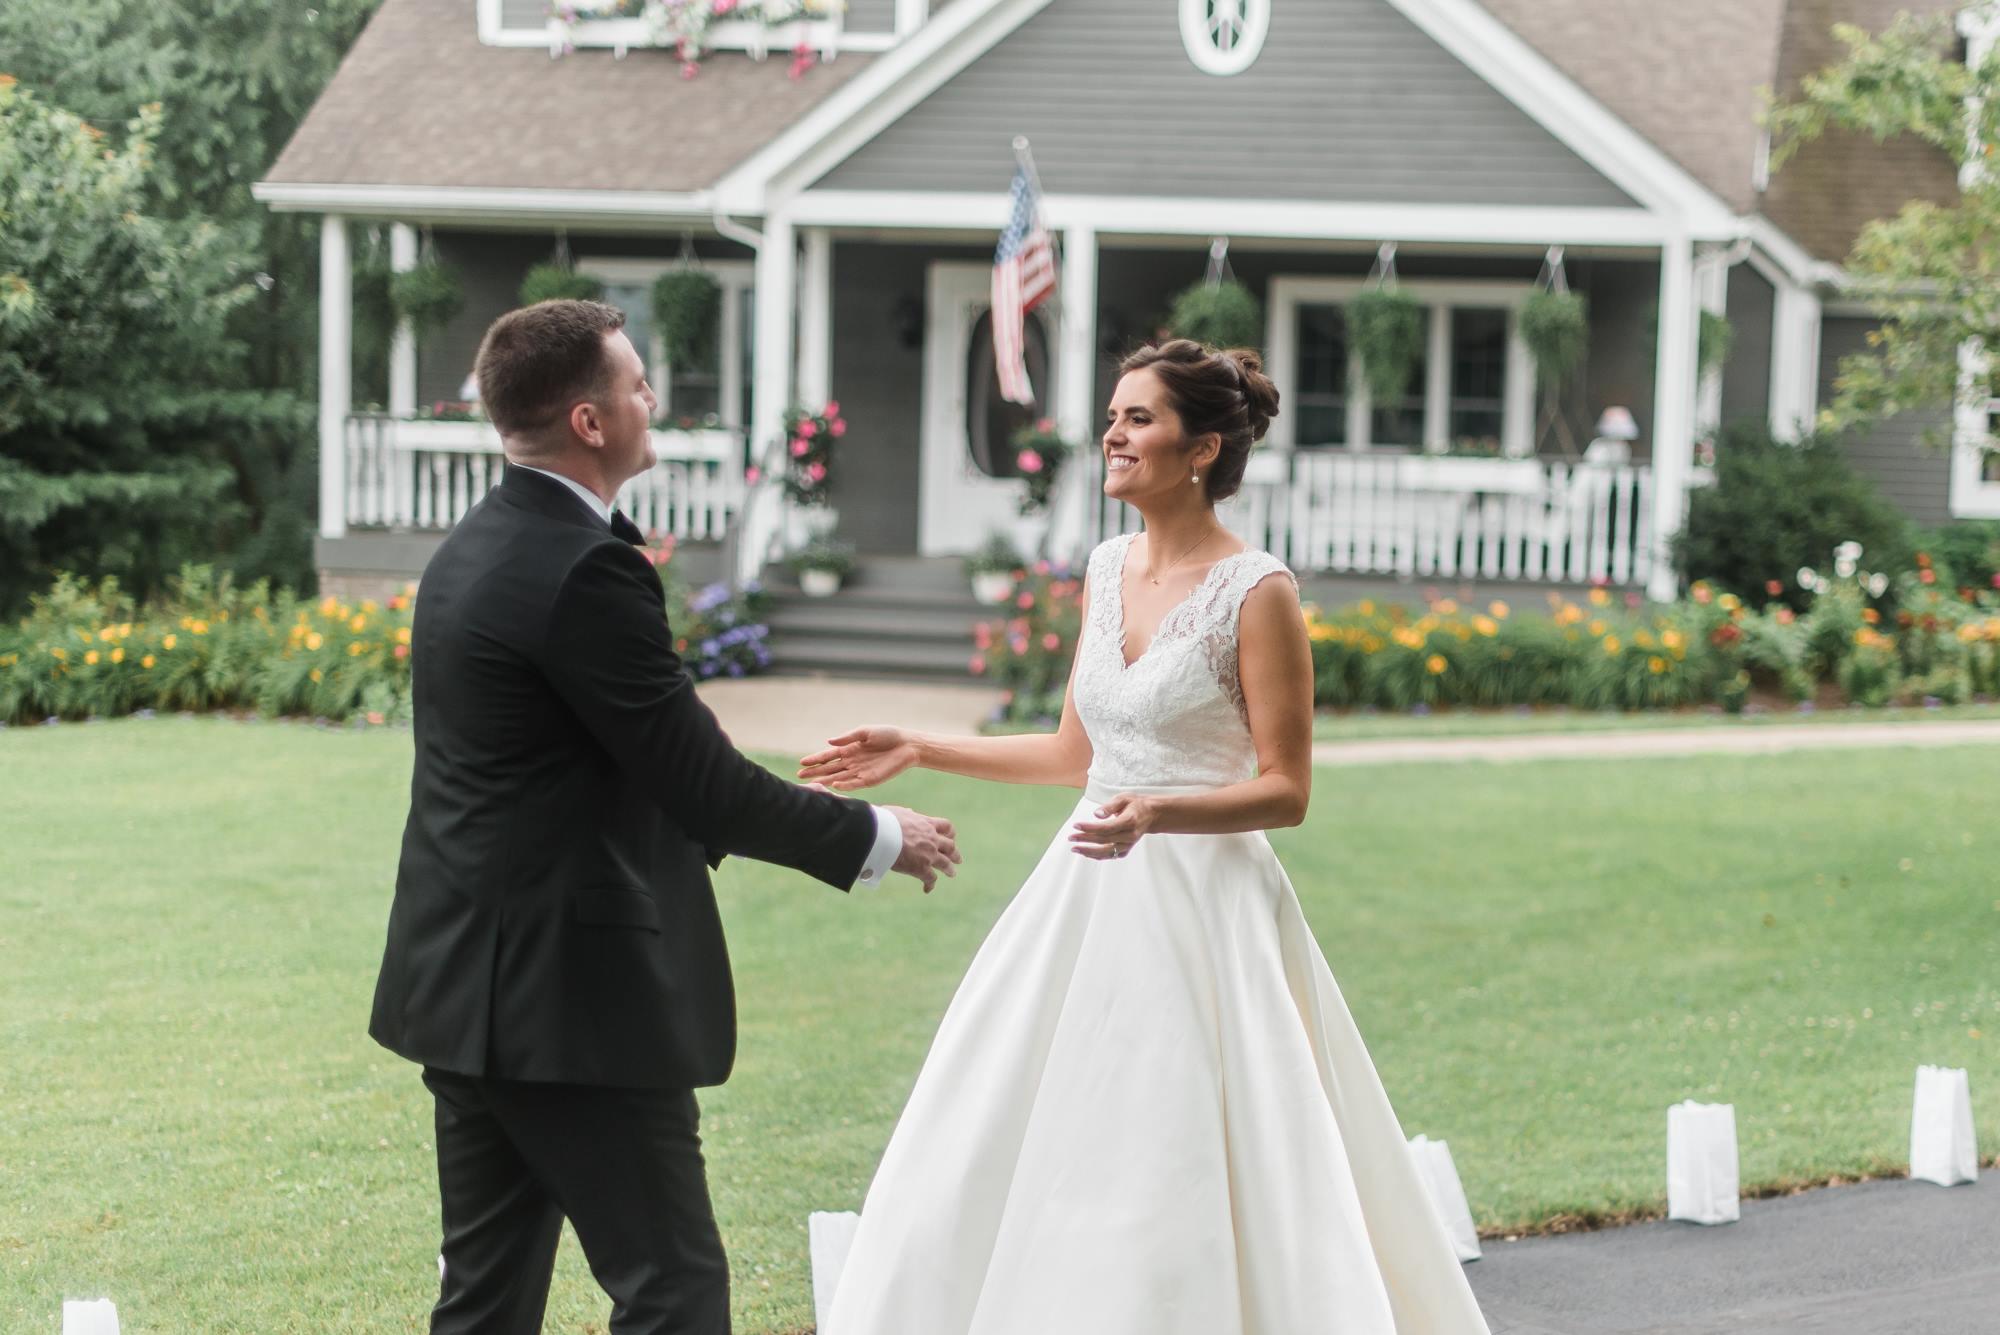 pittsburgh-pennsylvania-backyard-glam-chic-modern-classic-wedding-0010.jpg